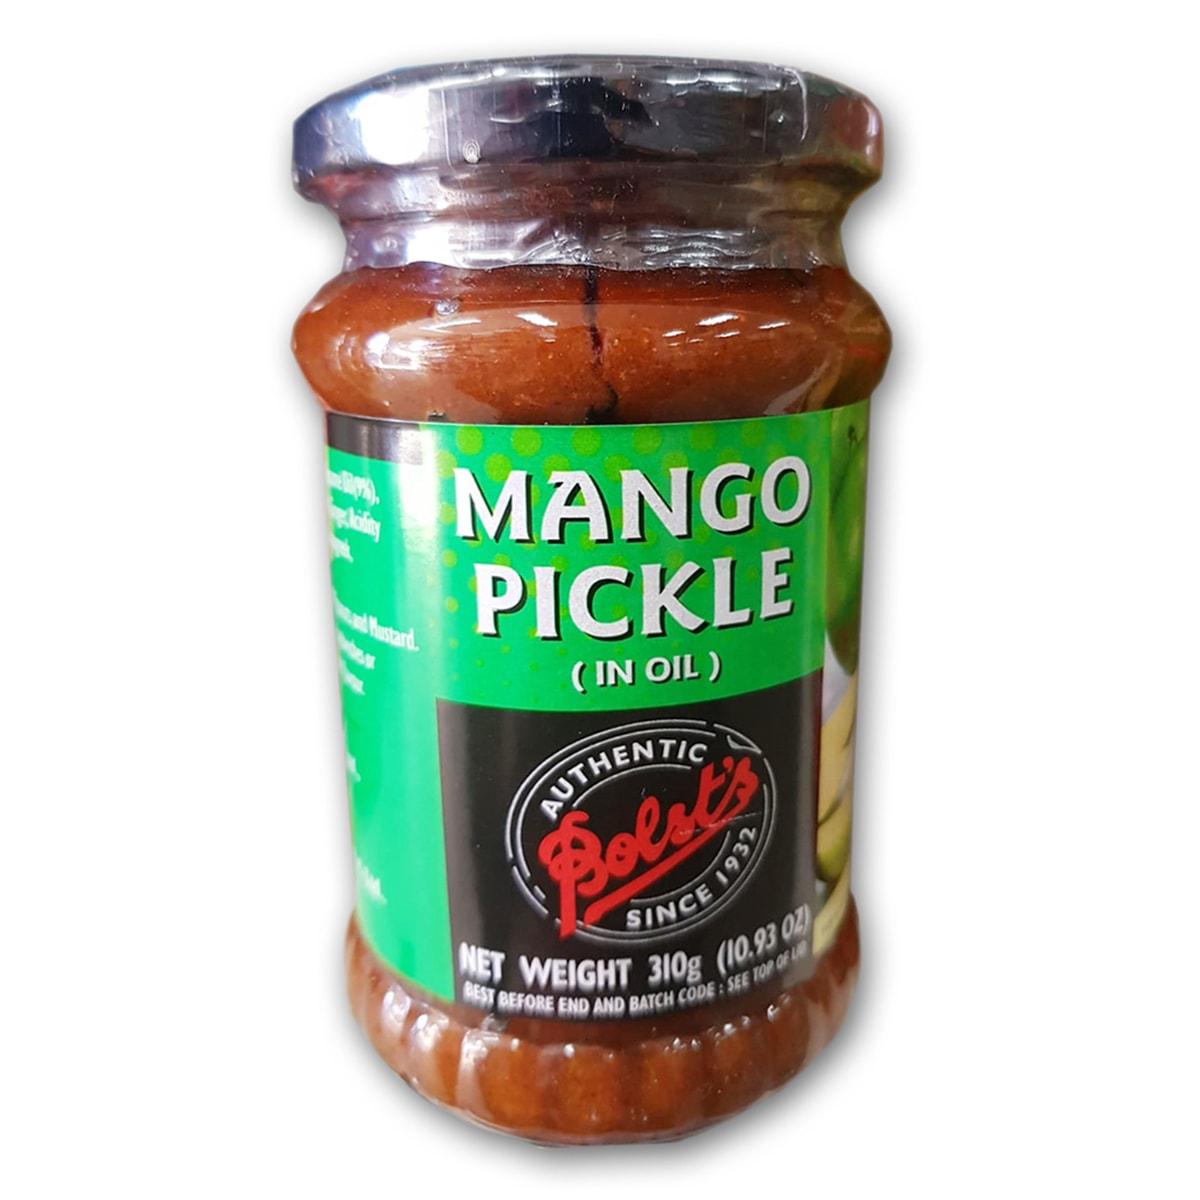 Buy Bolsts Mango Pickle (in Oil) - 310 gm